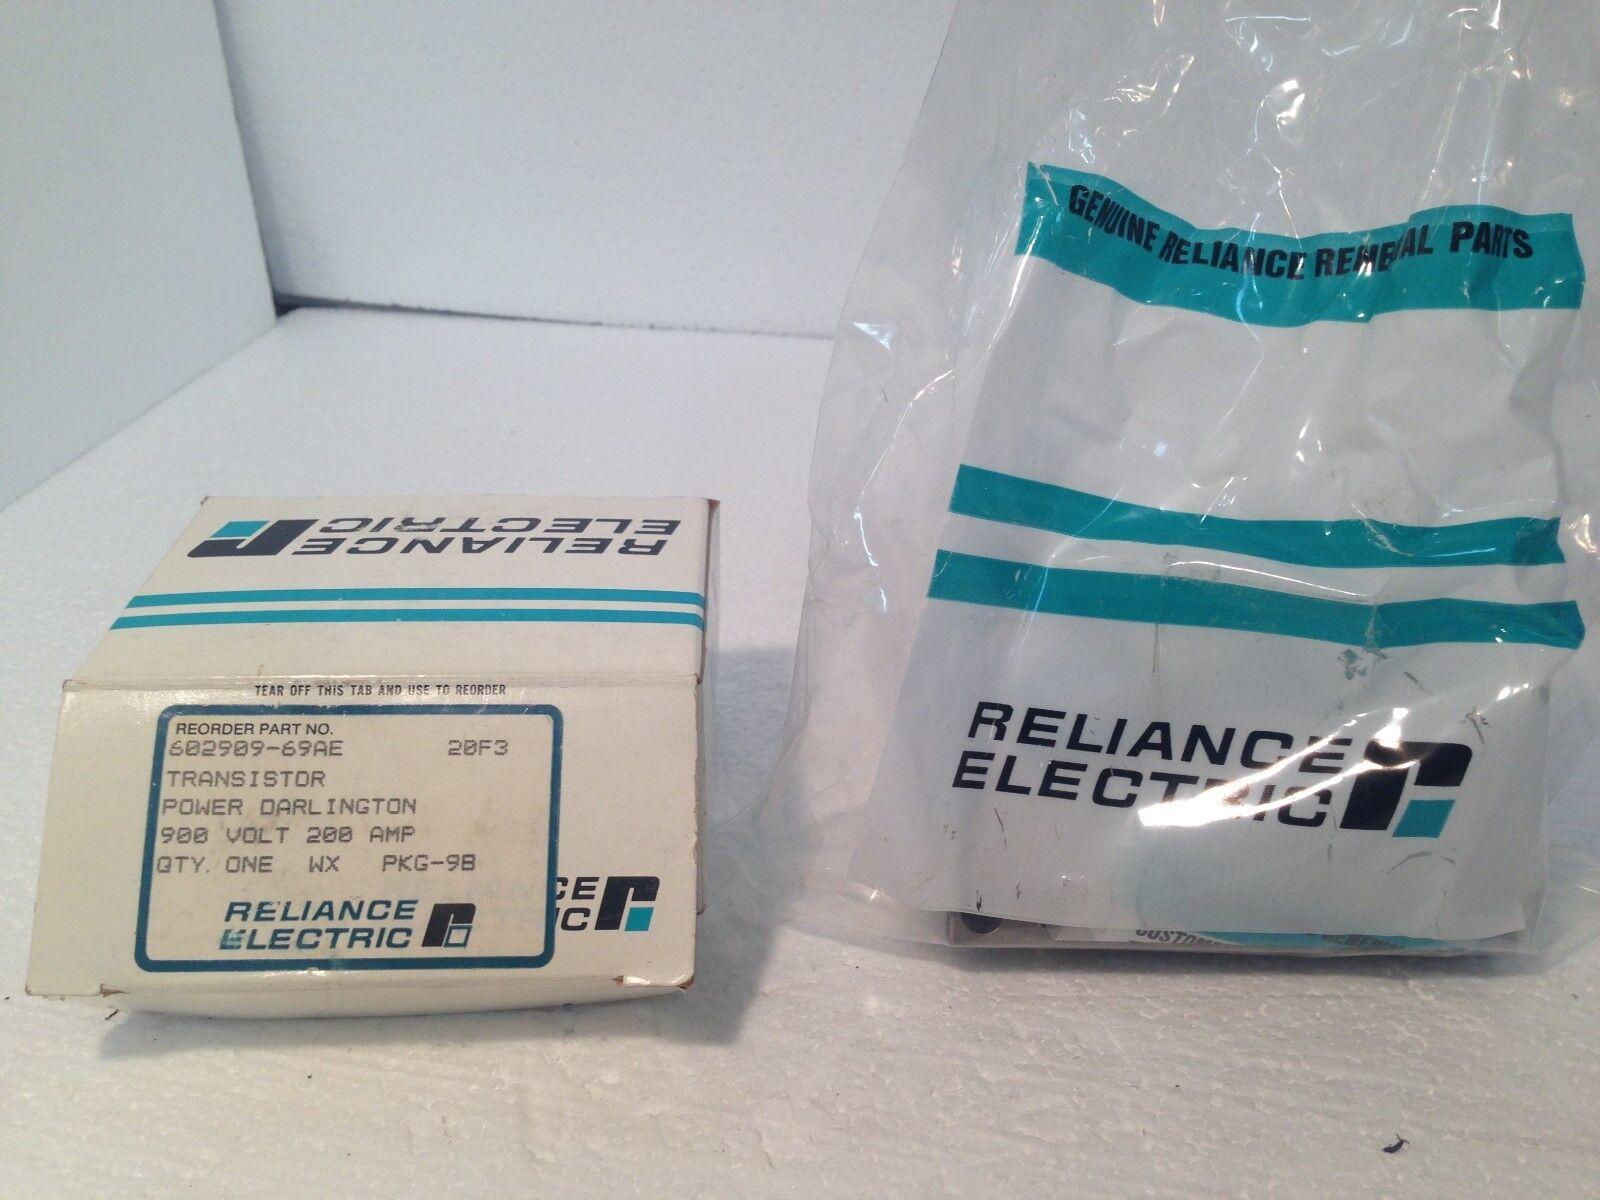 Nuevo en caja Reliance Reliance caja Electric 602909-69AE ET1266M Transistor 856381